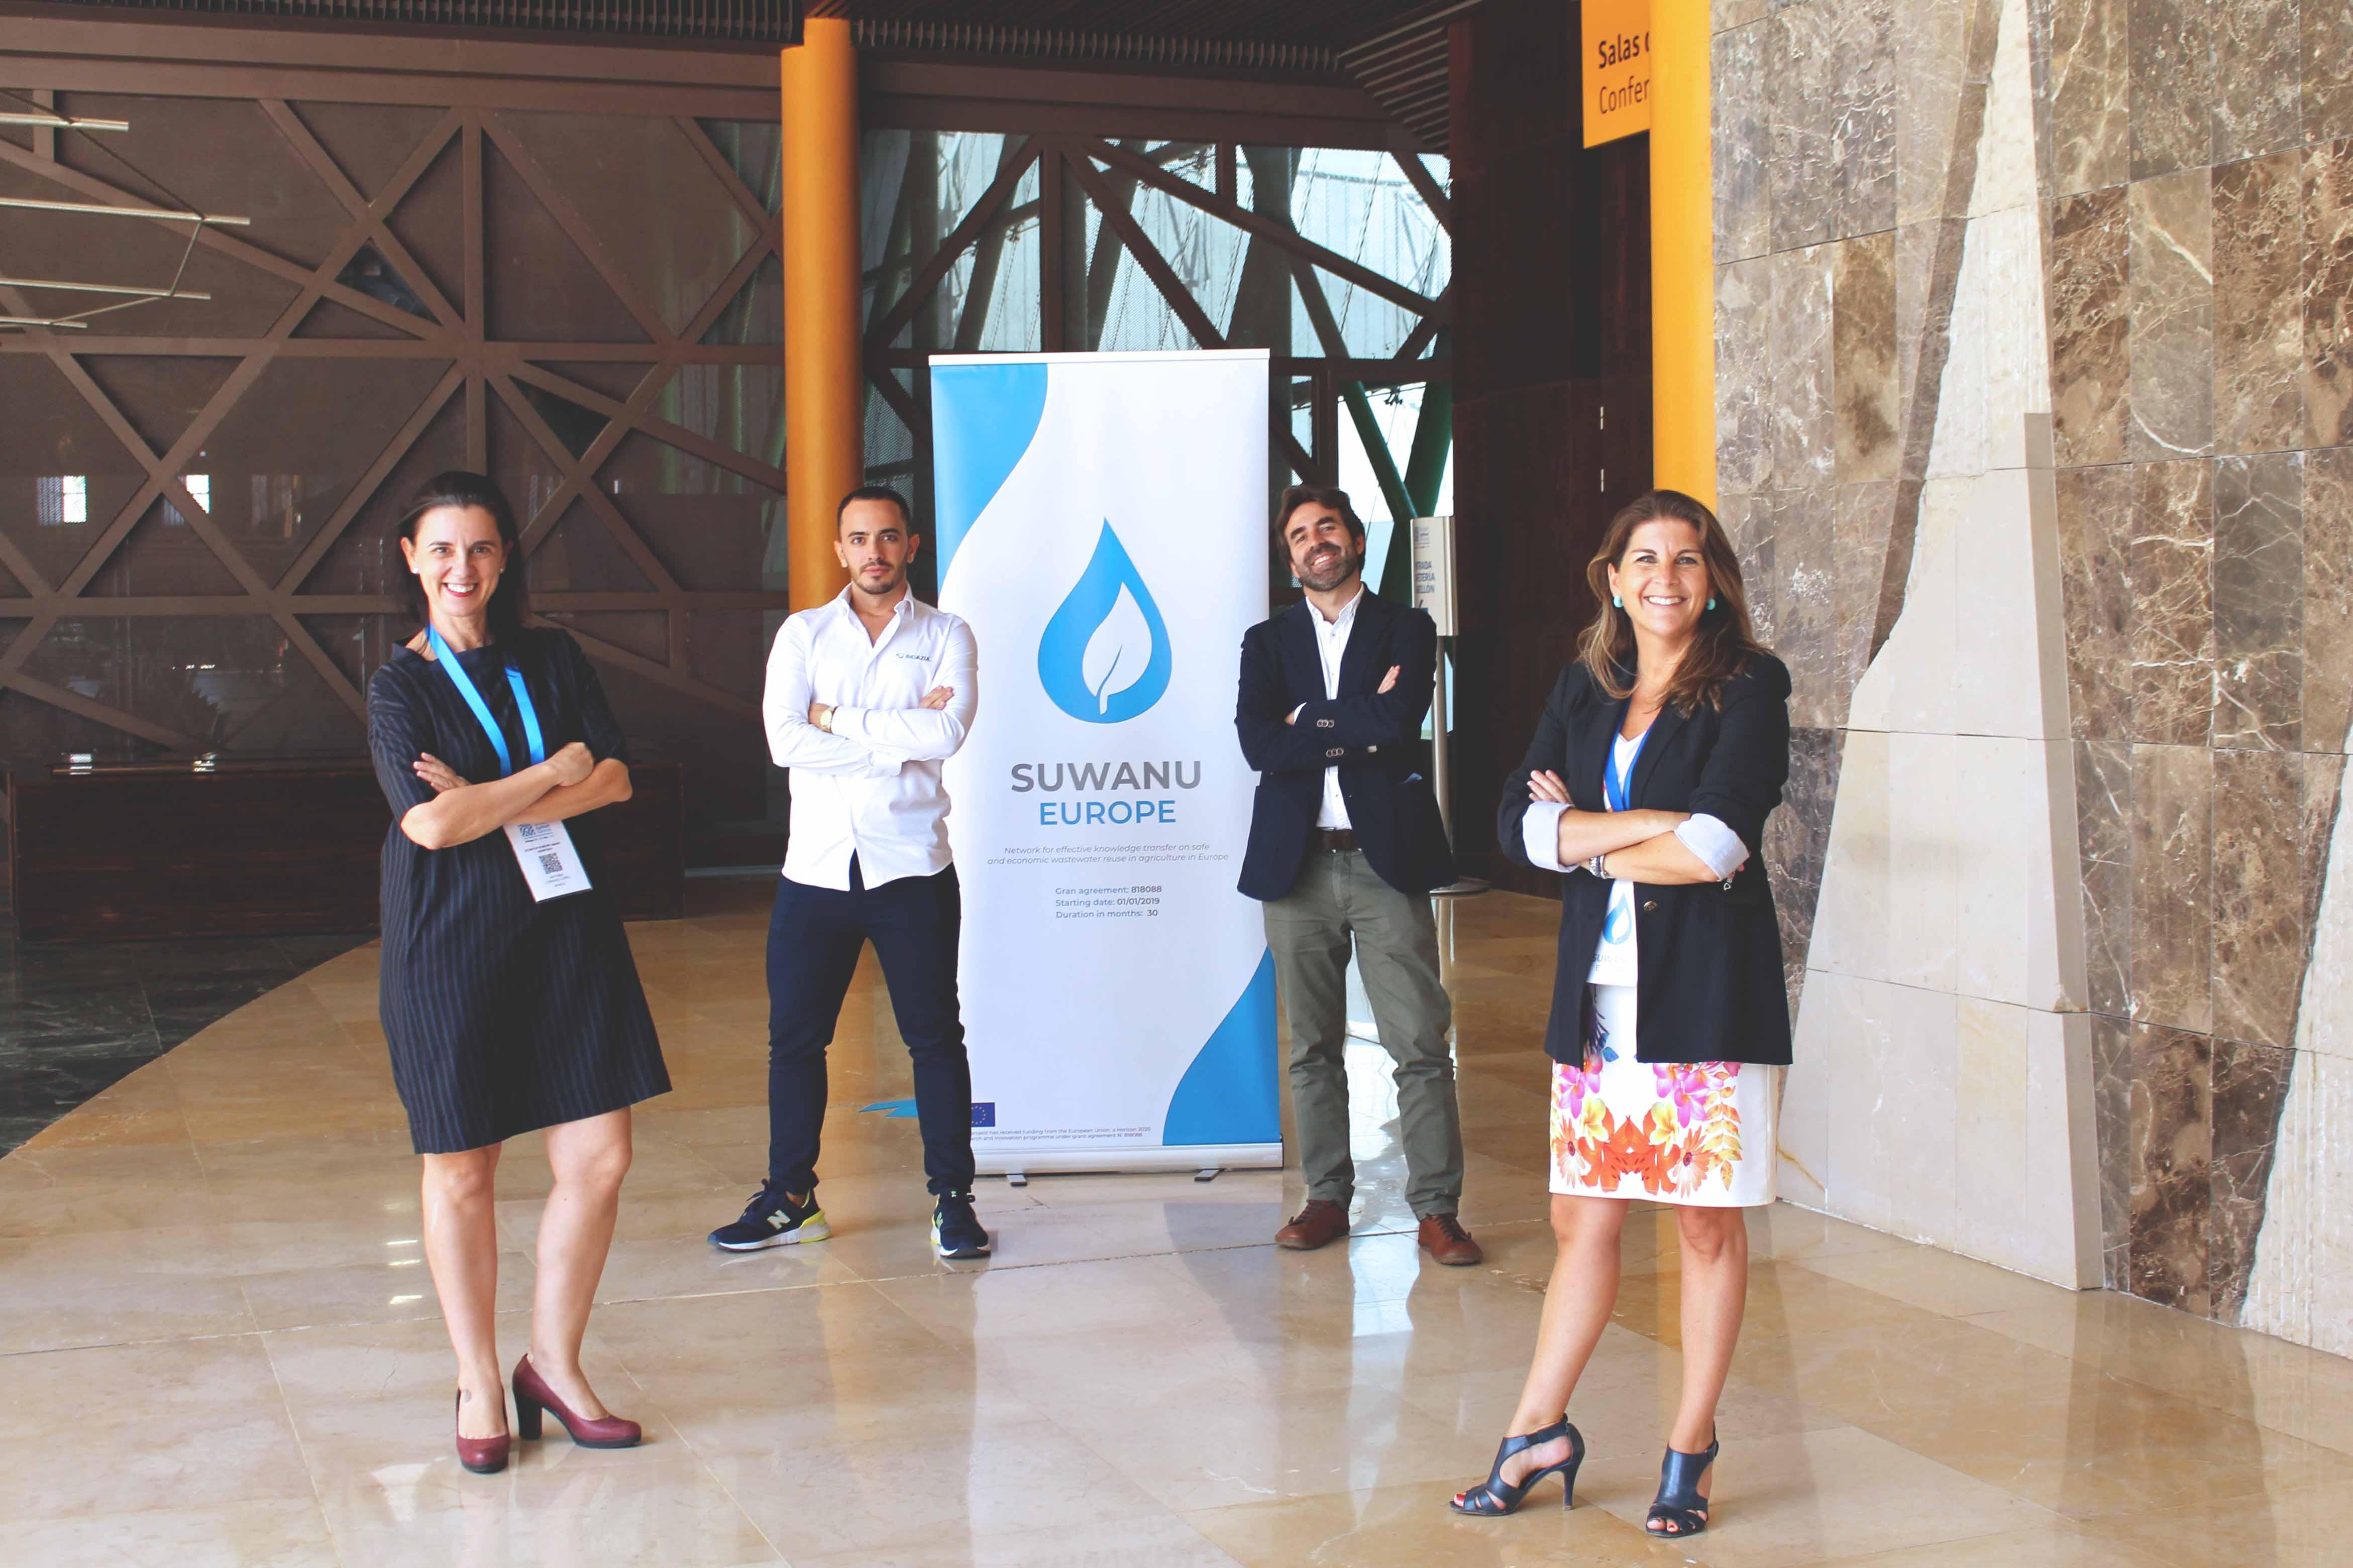 Bioazul team: Antonia Lorenzo, David Salaberri, Rafael Casielles and Ángela Magno